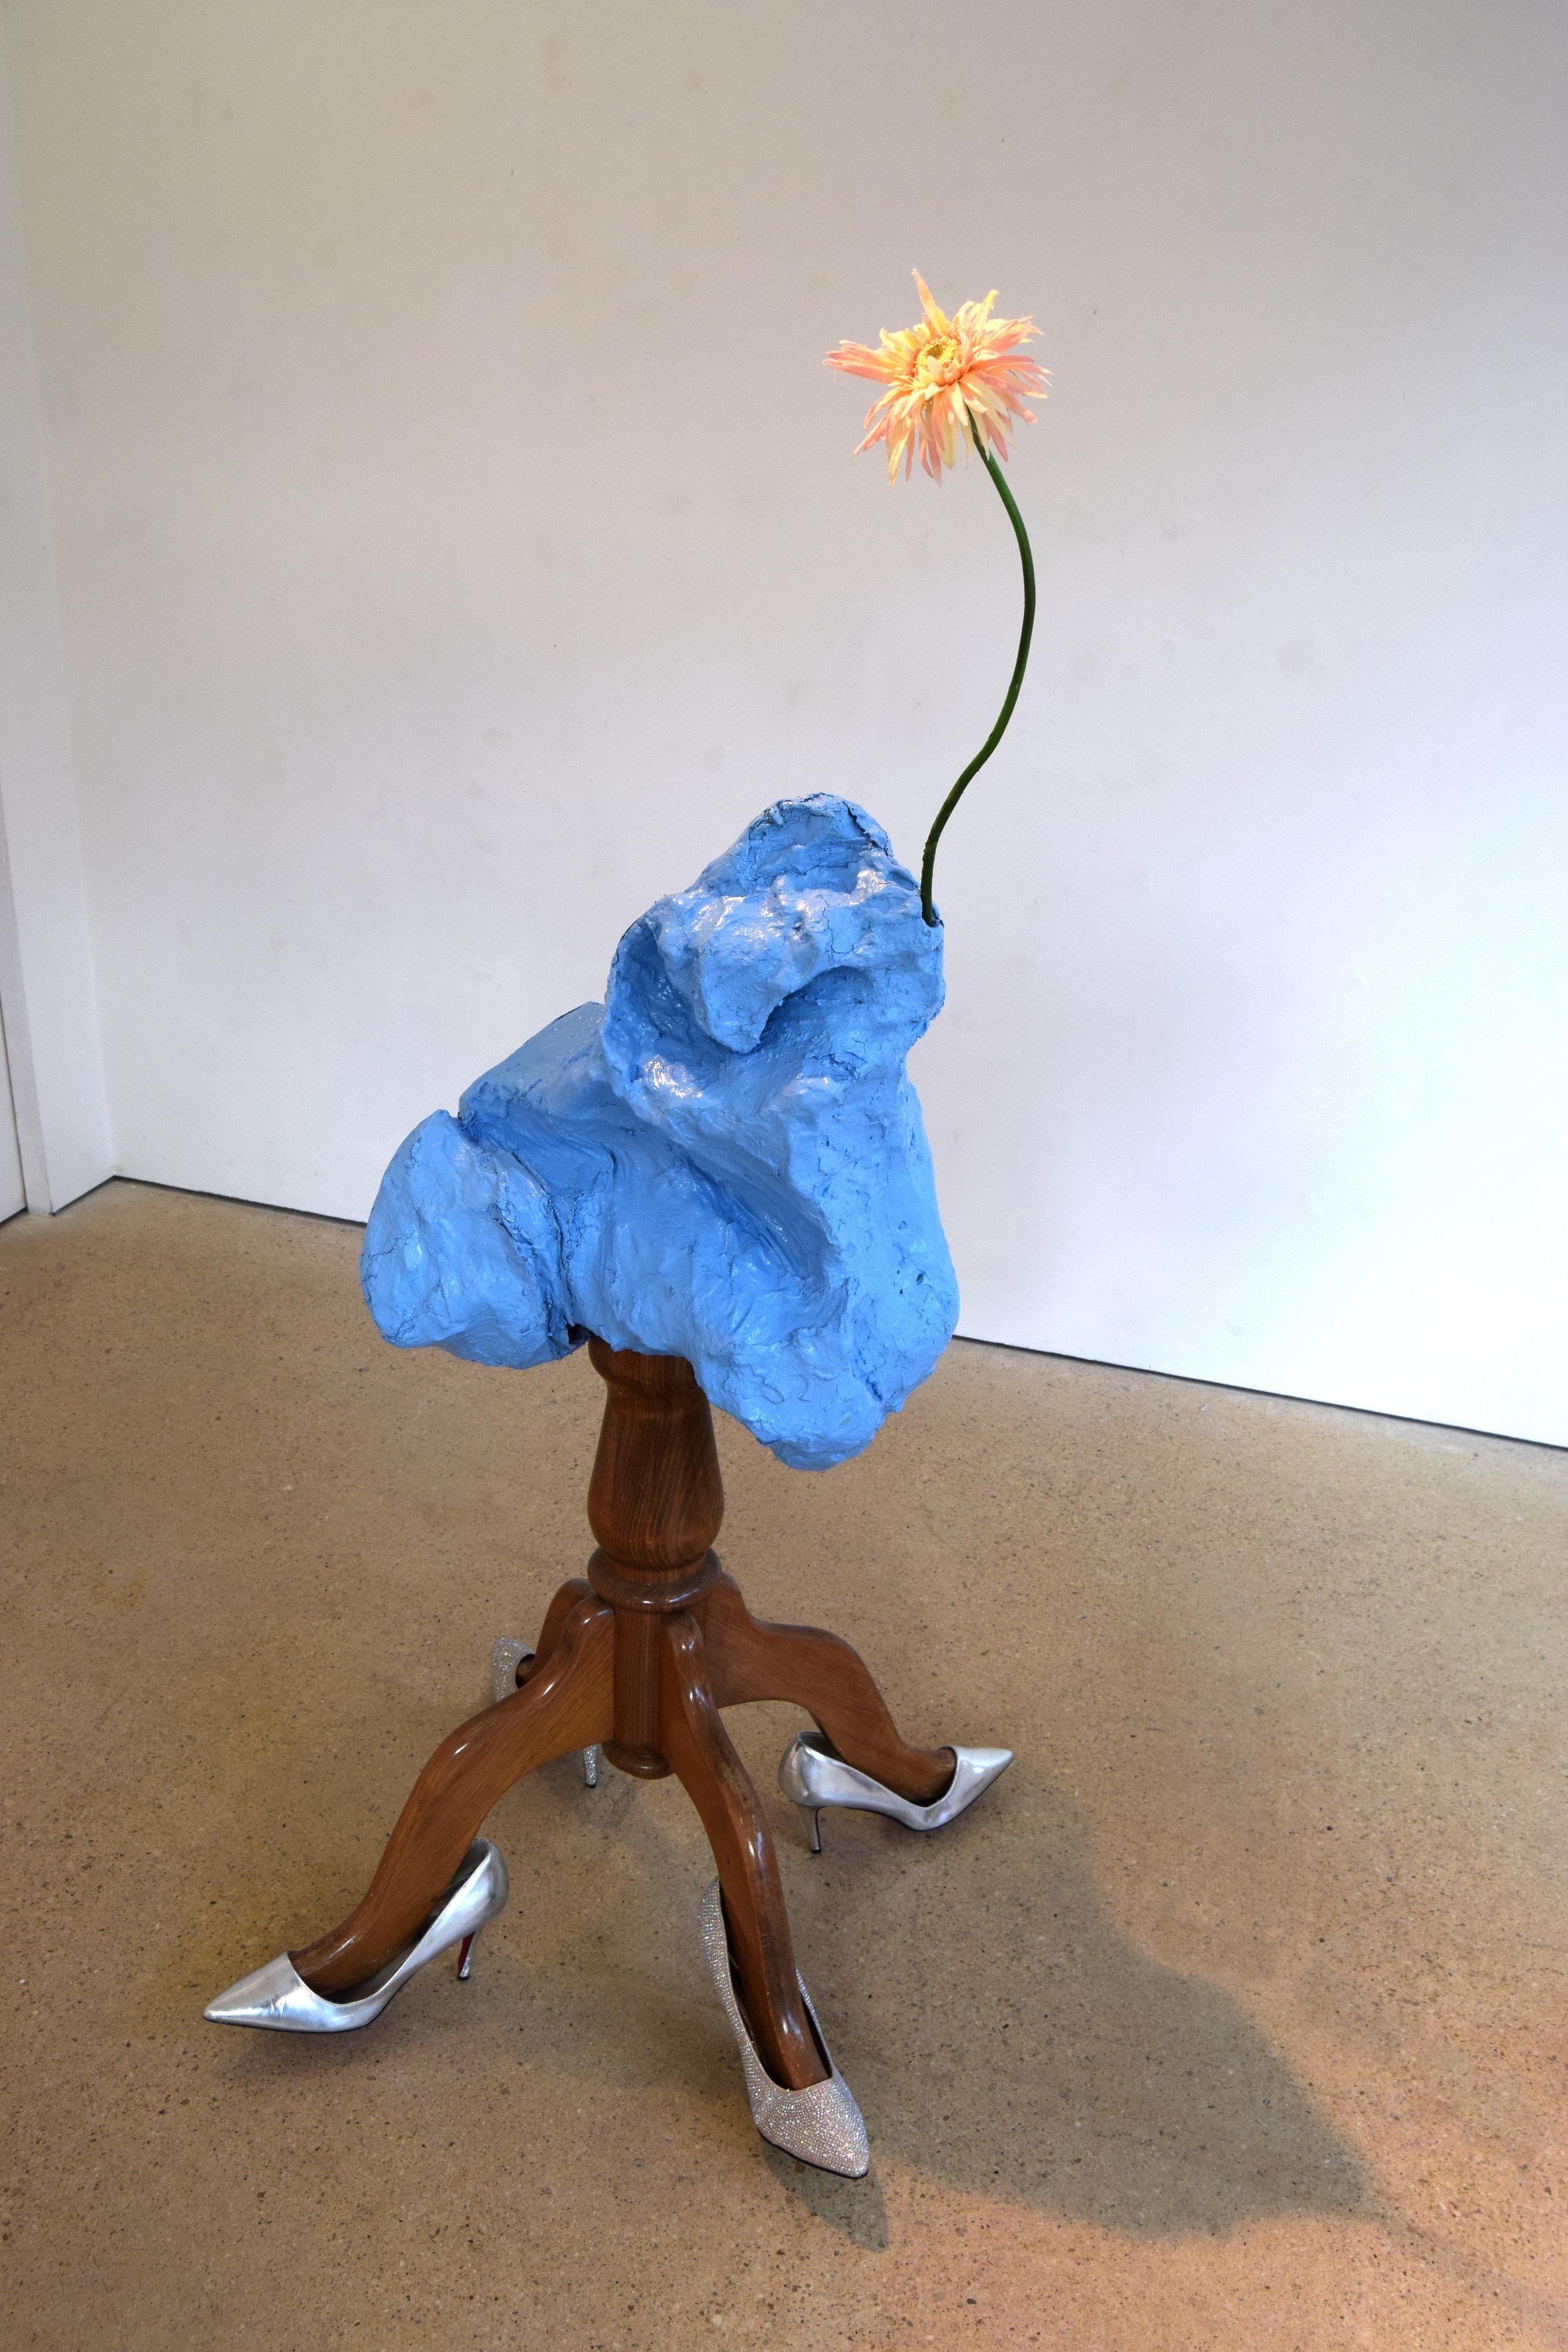 sean-heather-artist-sculpture-artwork-seanheatherart-seanheatherartist.jpg